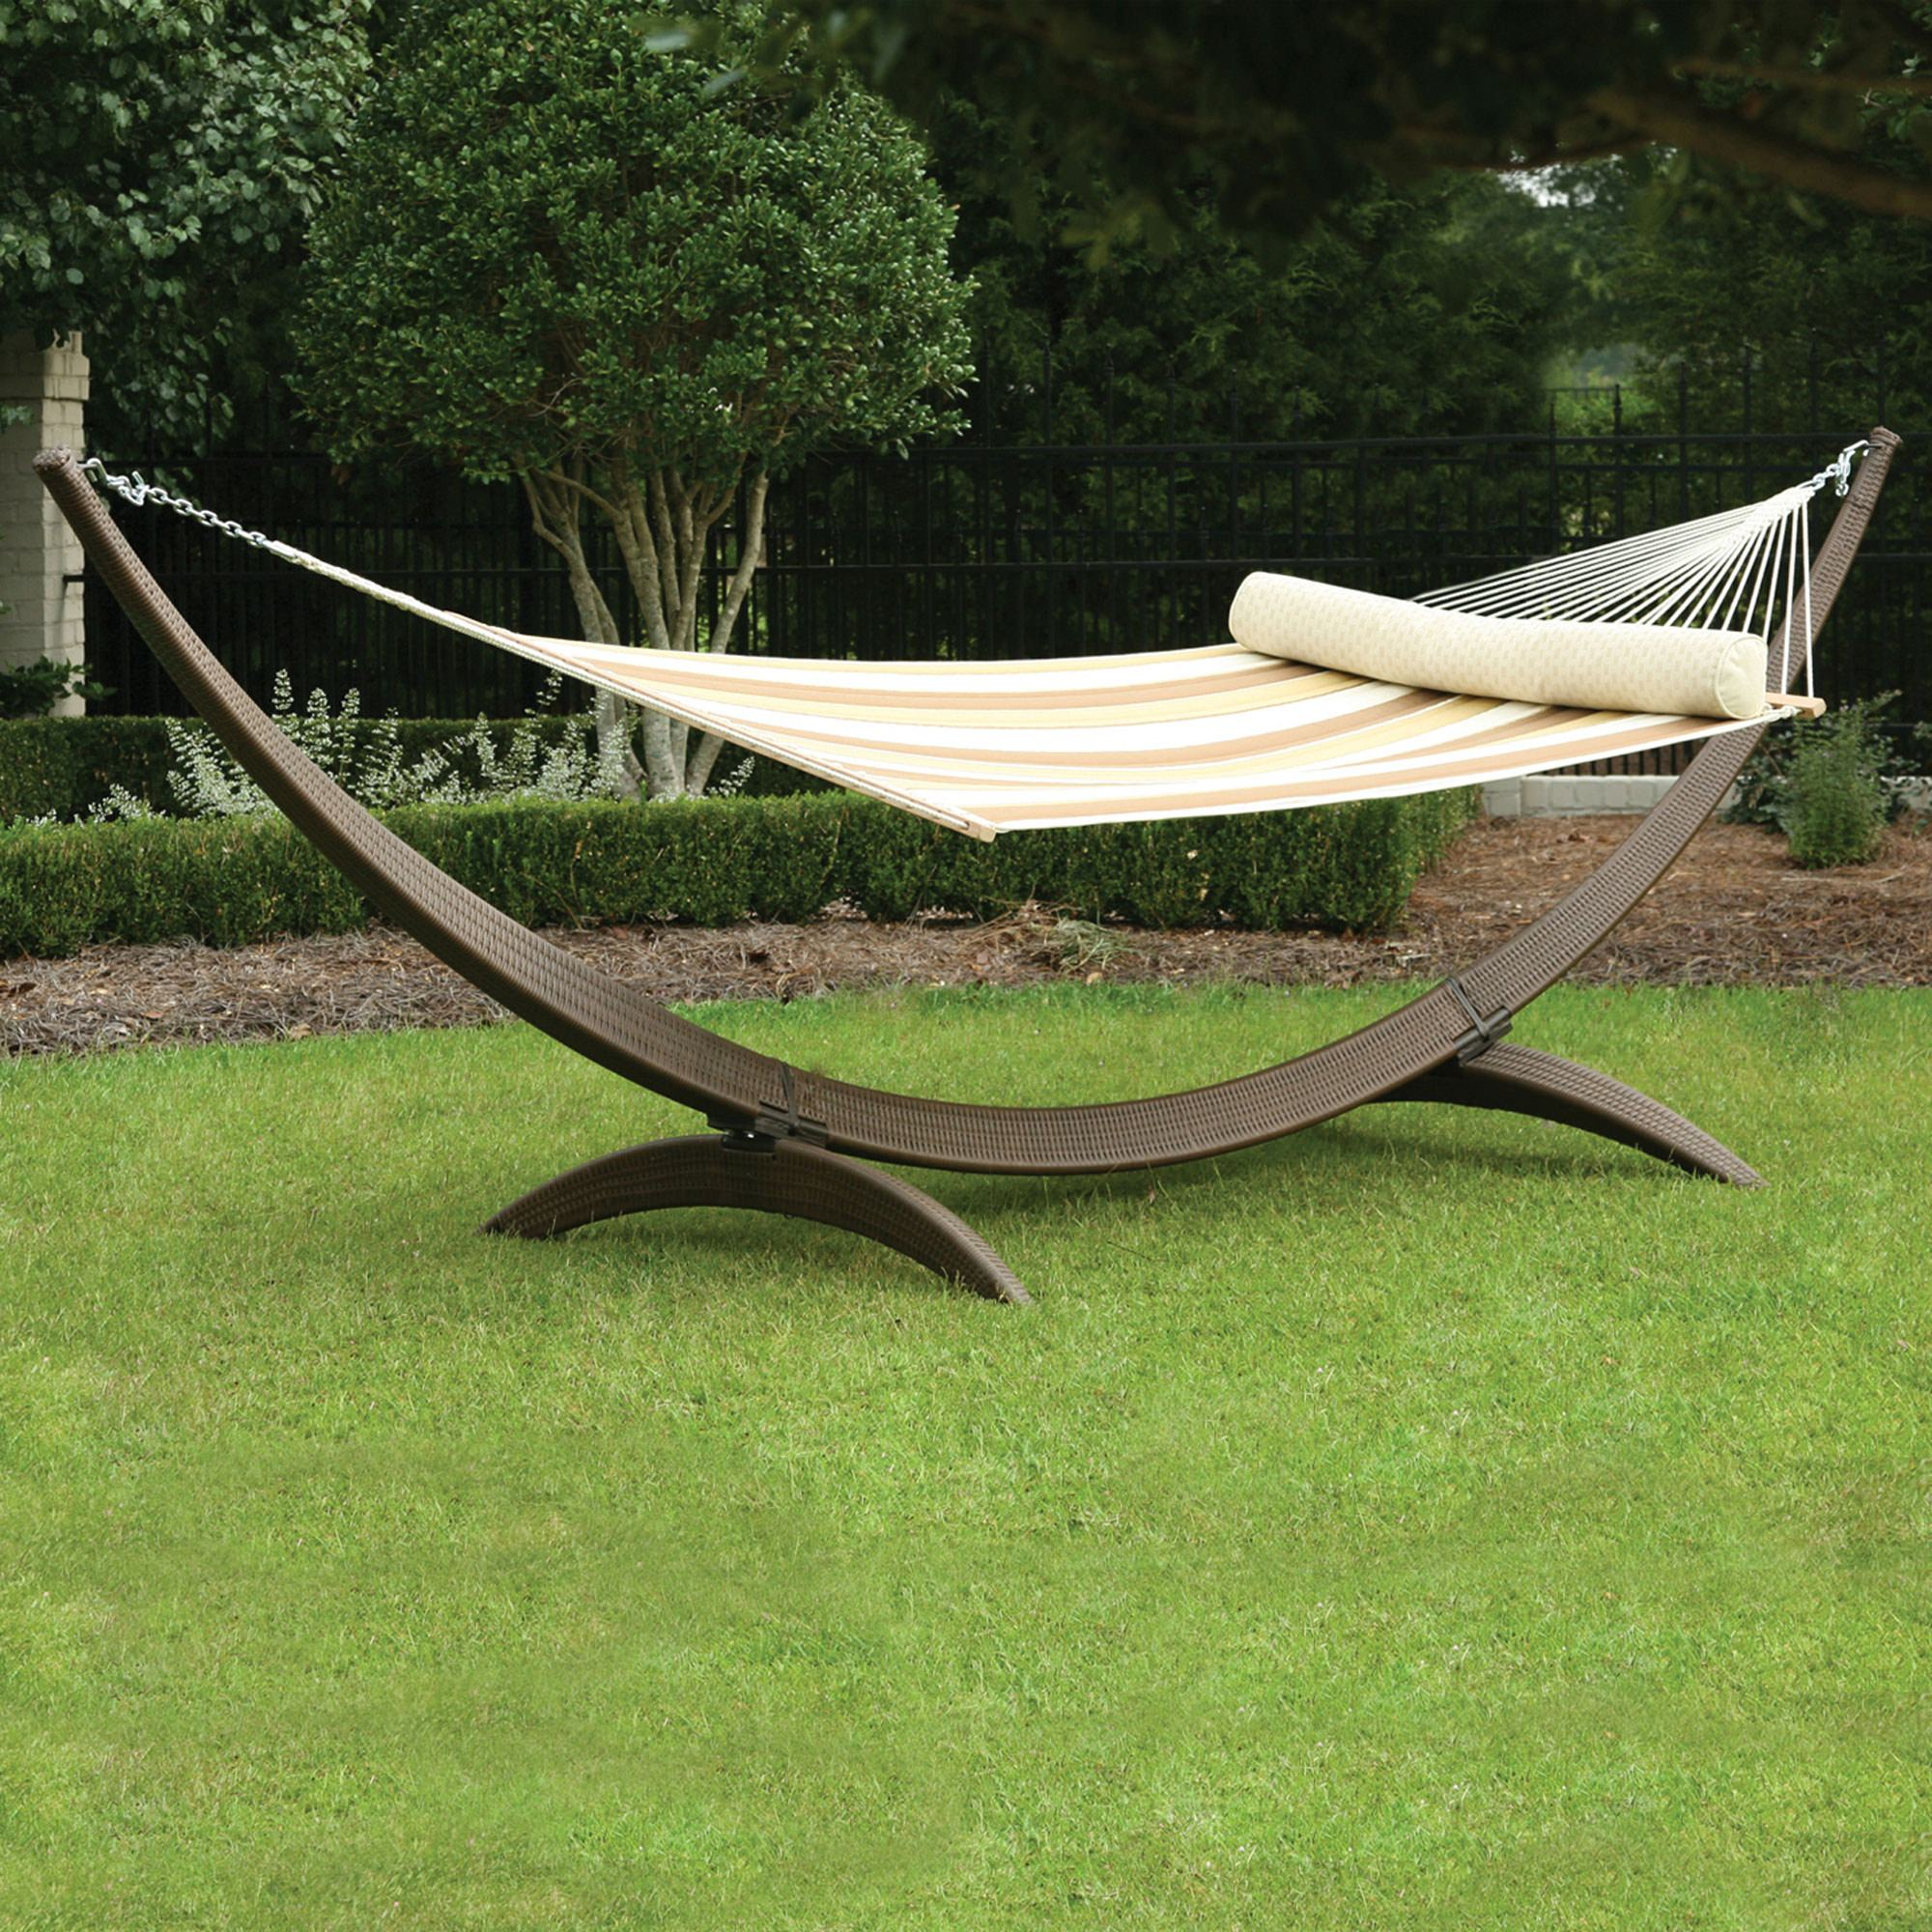 wicker hammock chair modern white leather desk roman arc all weather stand sar wick hatteras